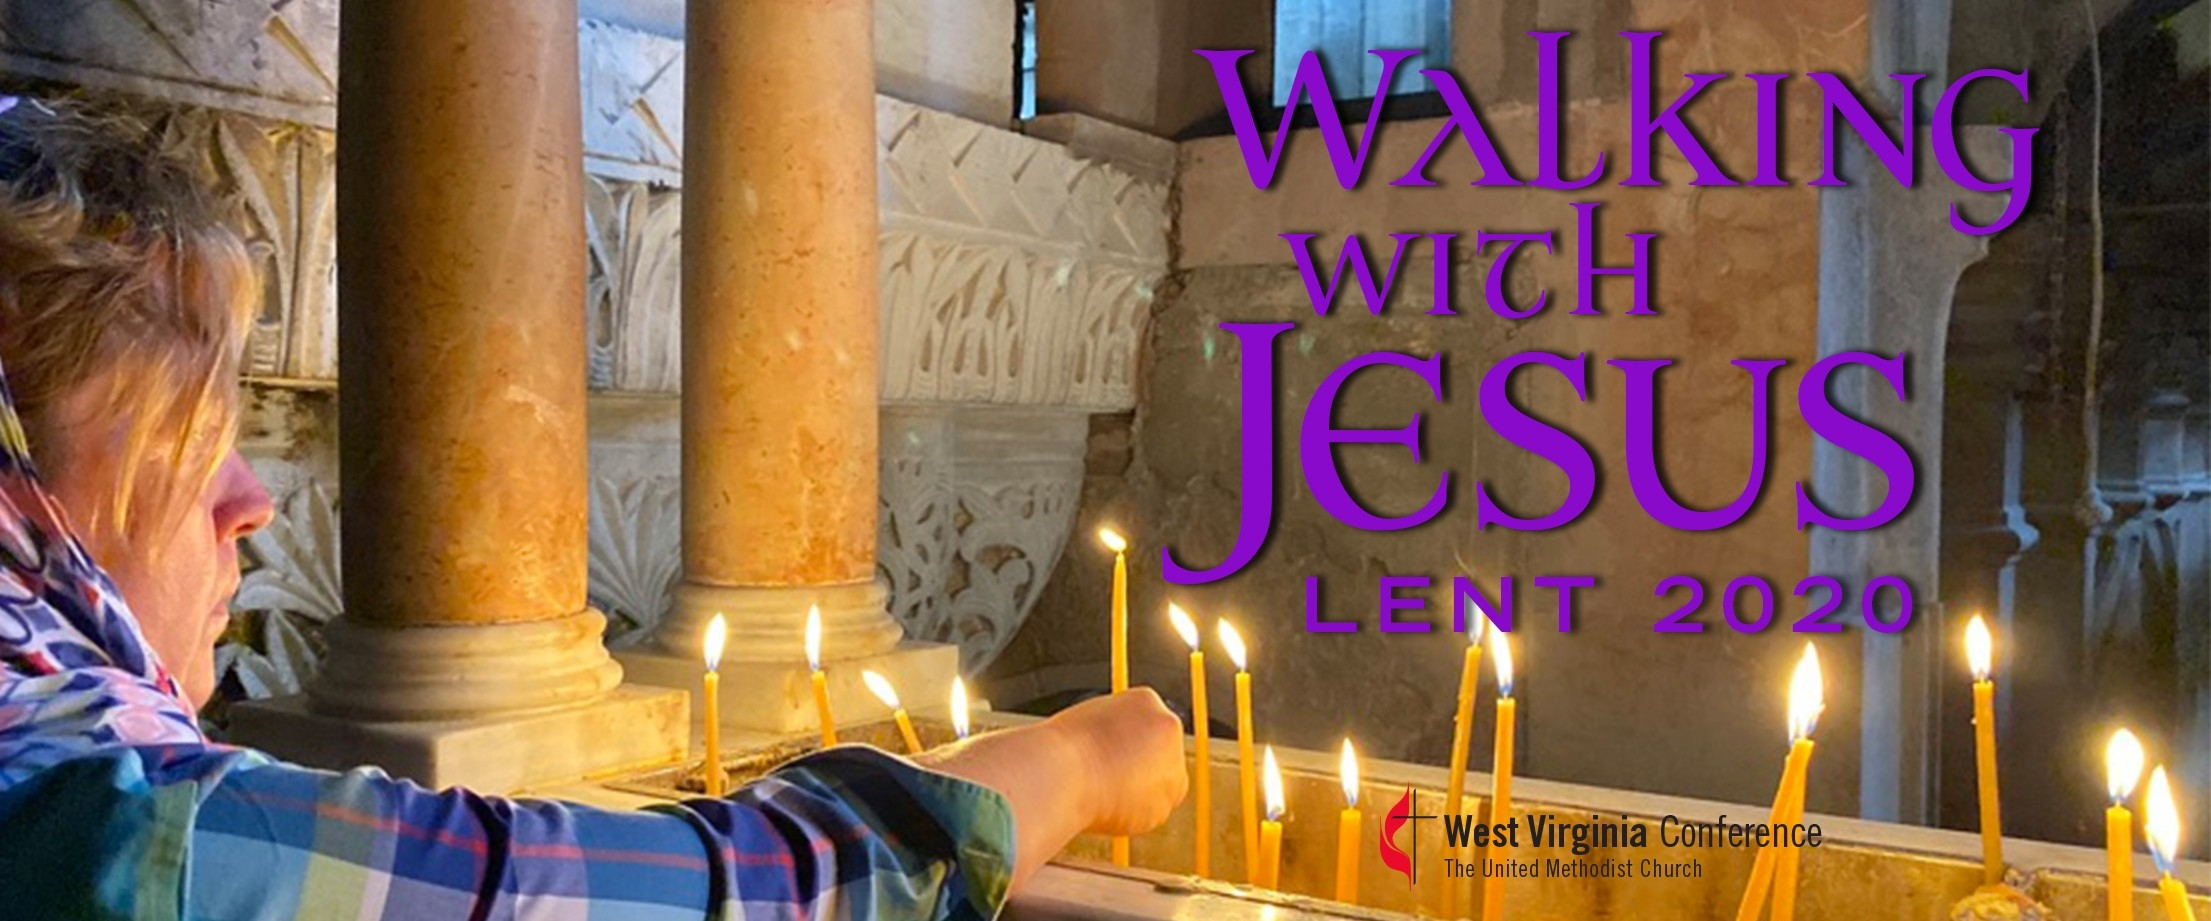 Walking With Jesus: Lent Week 4 | West Virginia Conference  Methodist Lent 2020